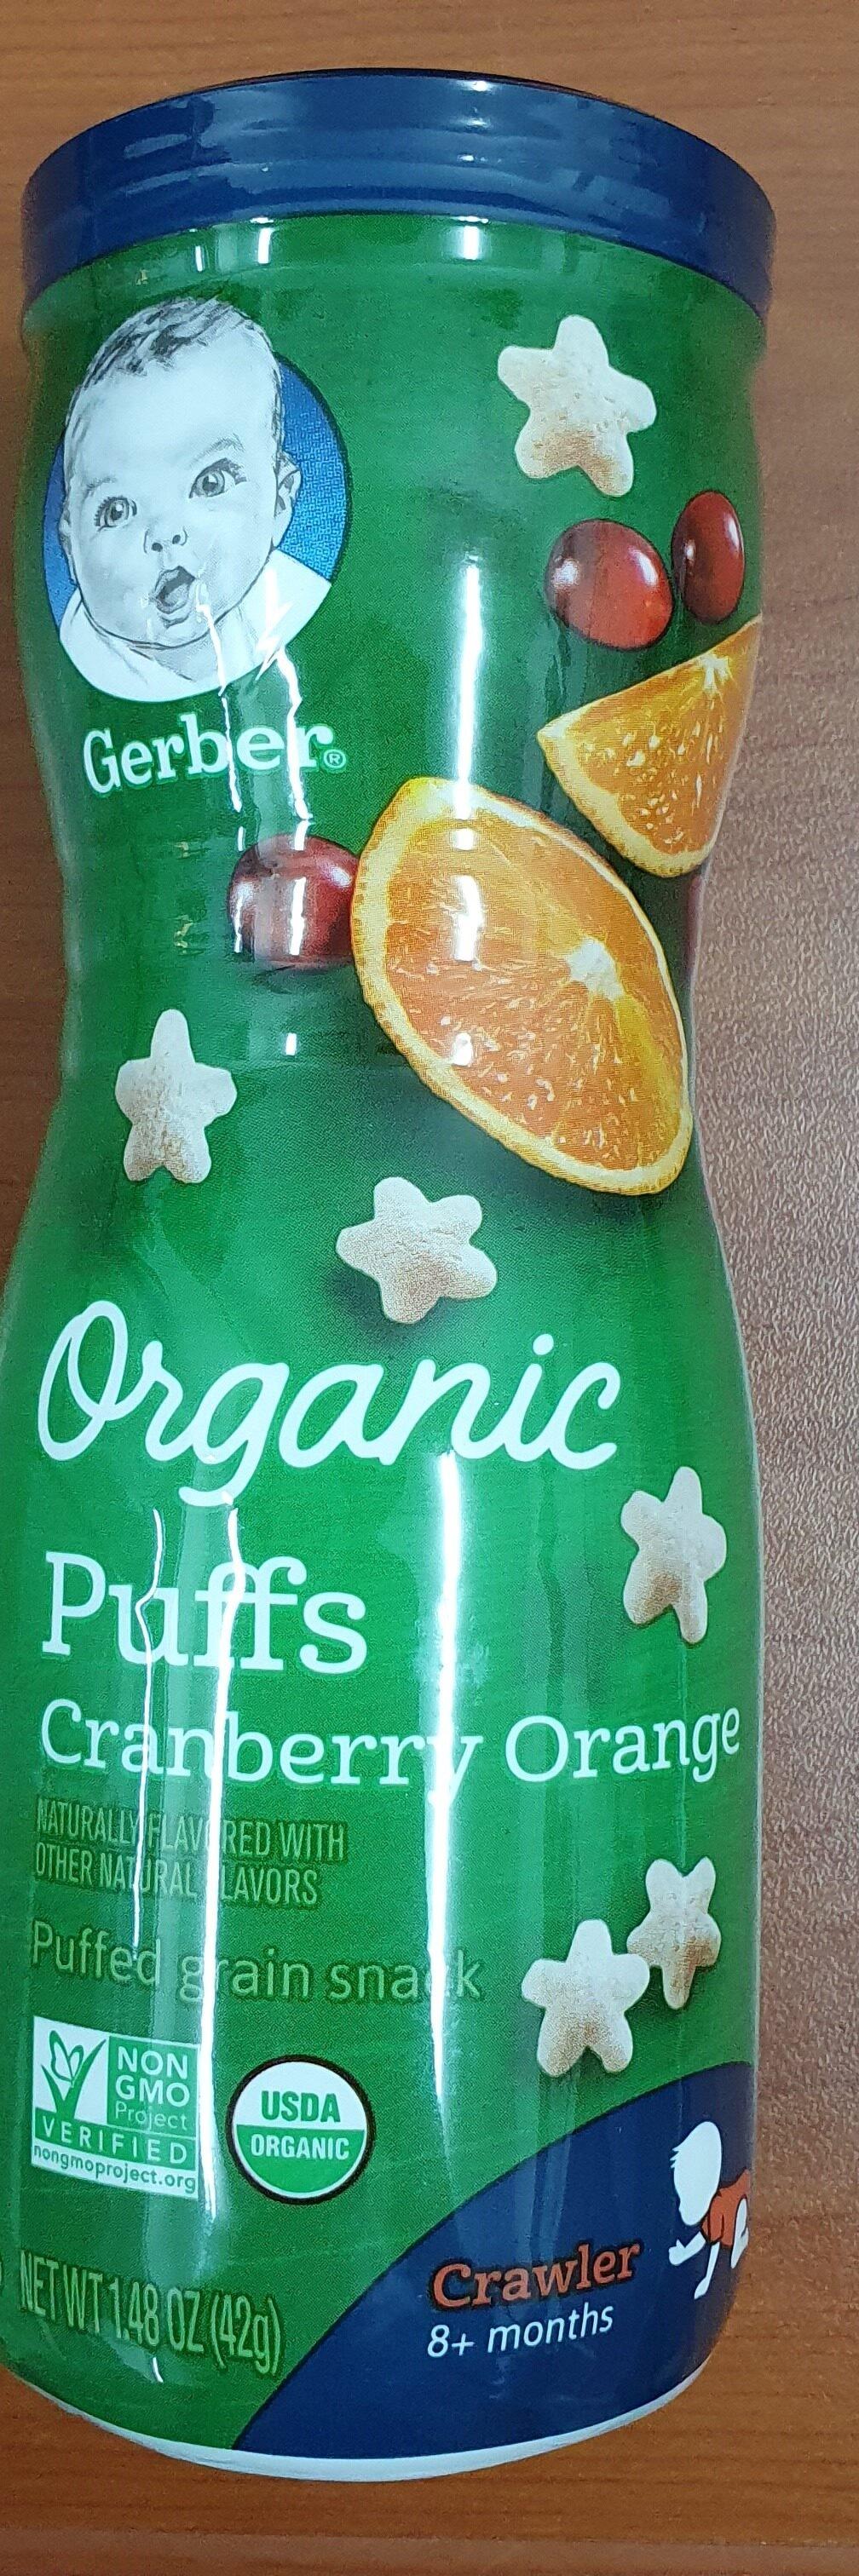 Gerber Organic Puffs Grain Snack Cranberry Orange 42g Twin Pack